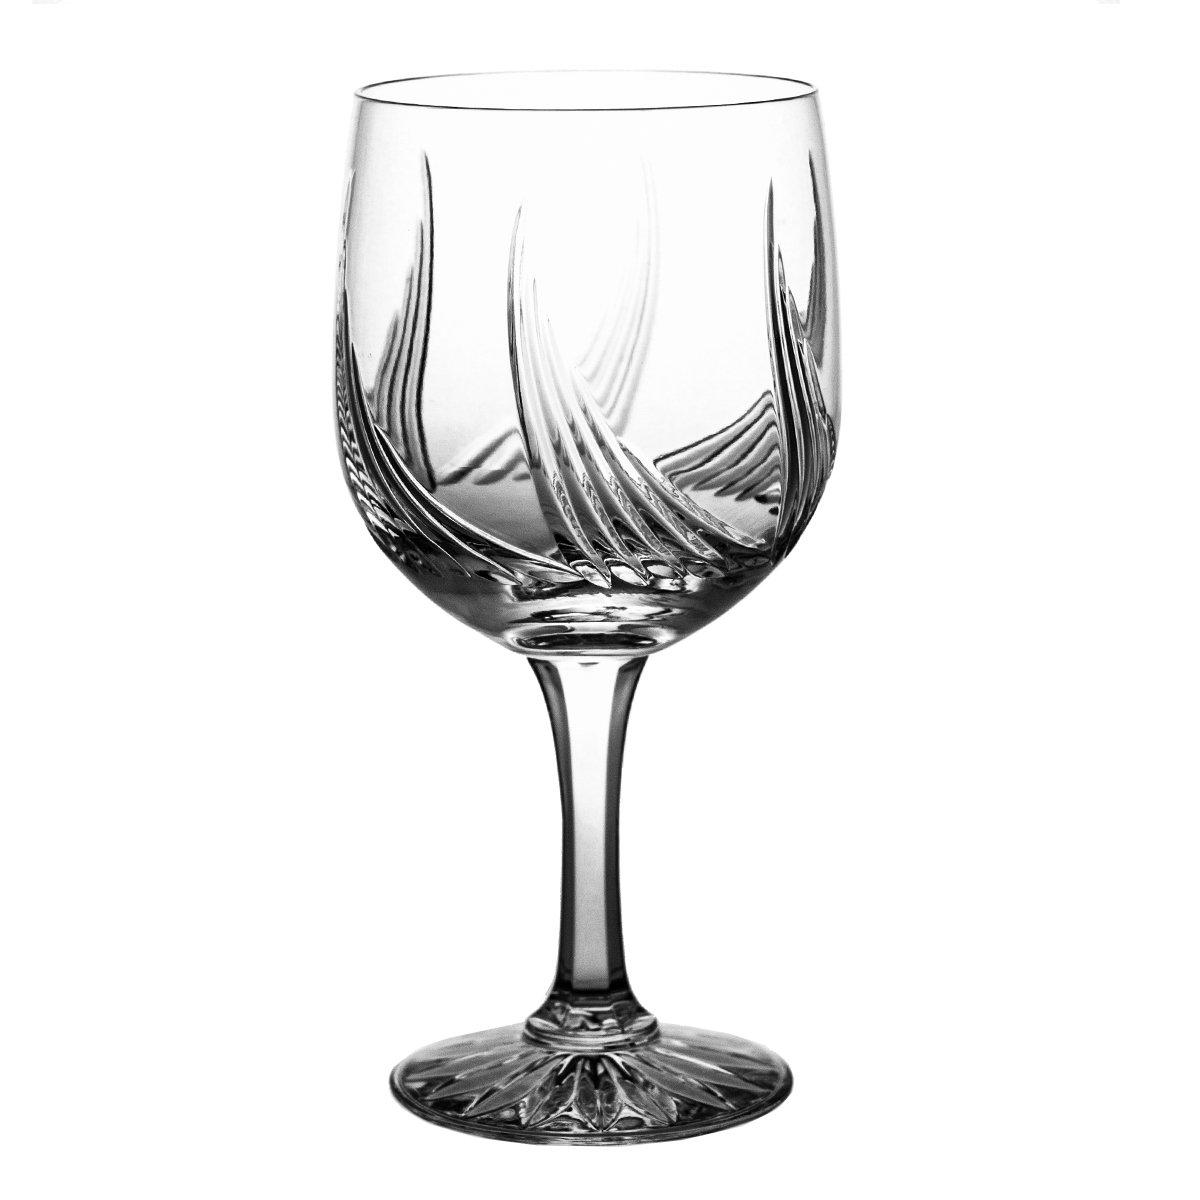 Pack of Aljulia 6642Water Glass Lead Crystal Carved-Retail Packaging-Alium Line, Set of 6, 500ml